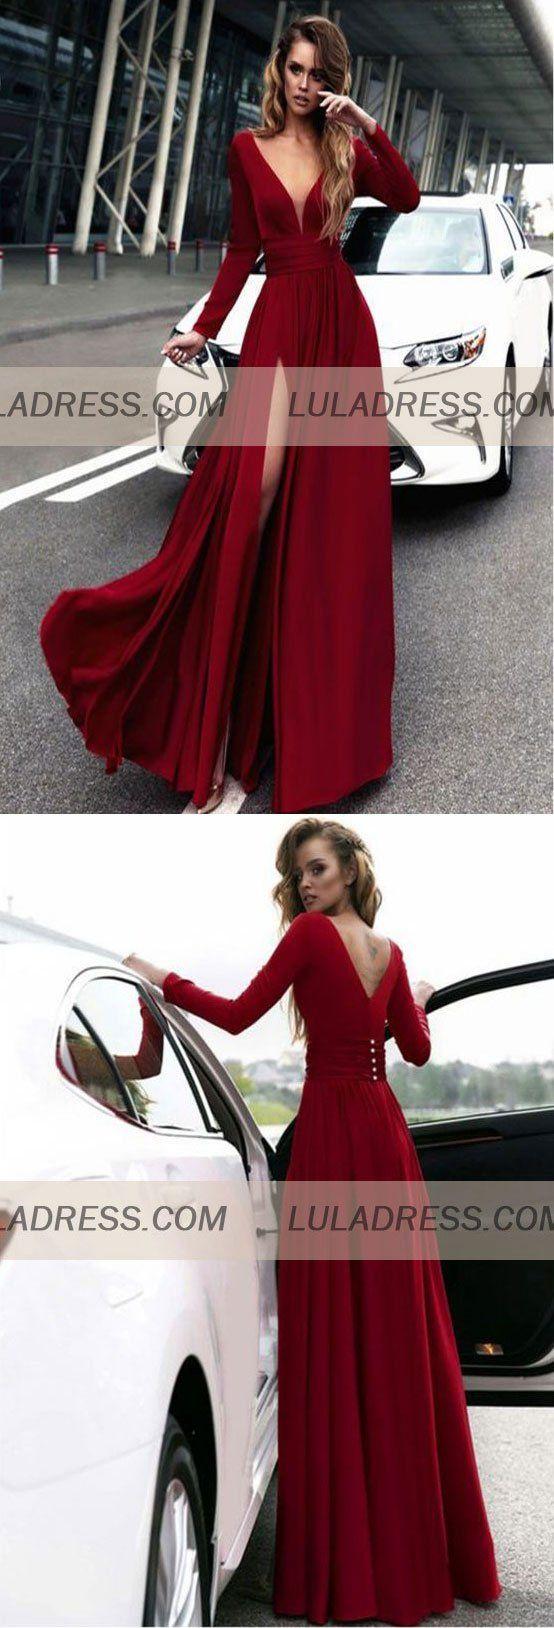 Gorgeous long prom dresses long sleeves prom dressbd